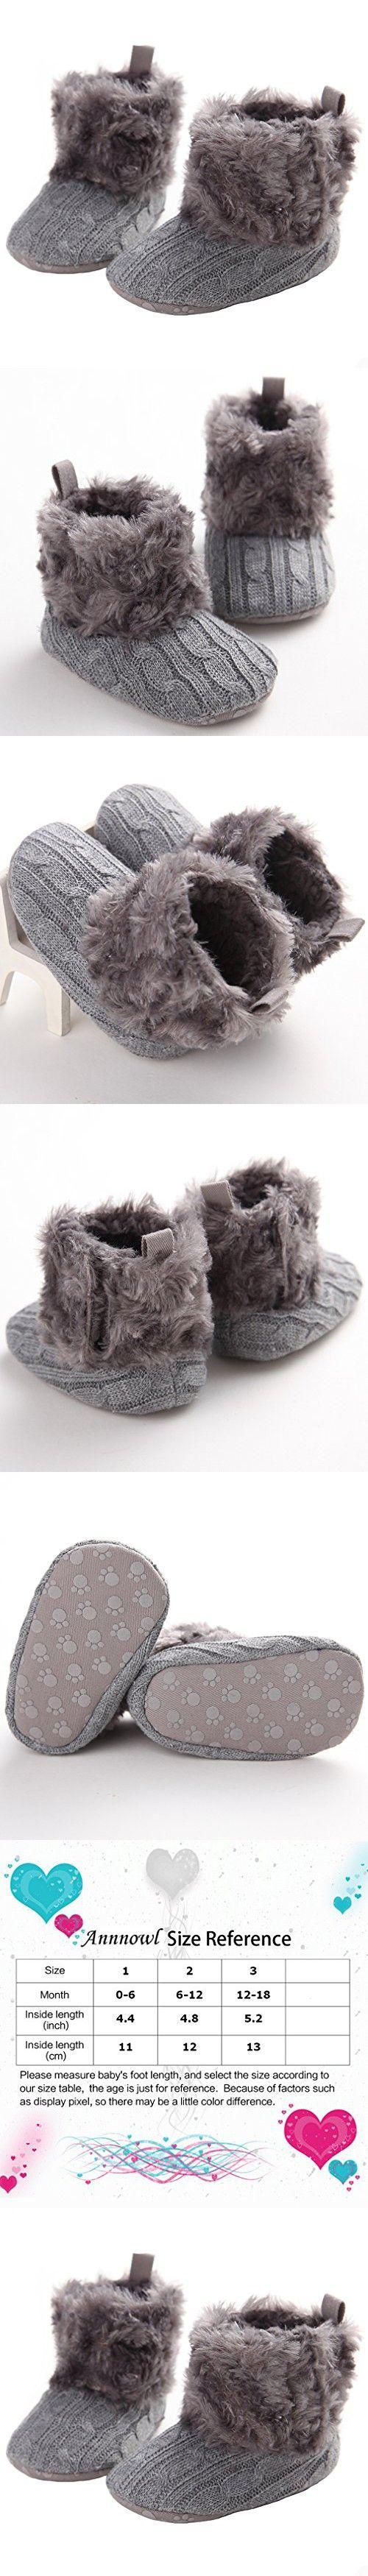 Annnowl Baby Girls Knit Soft Fur Winter Warm Snow Boots Crib Shoes 0-18 Months (0-6 Months, Gray)